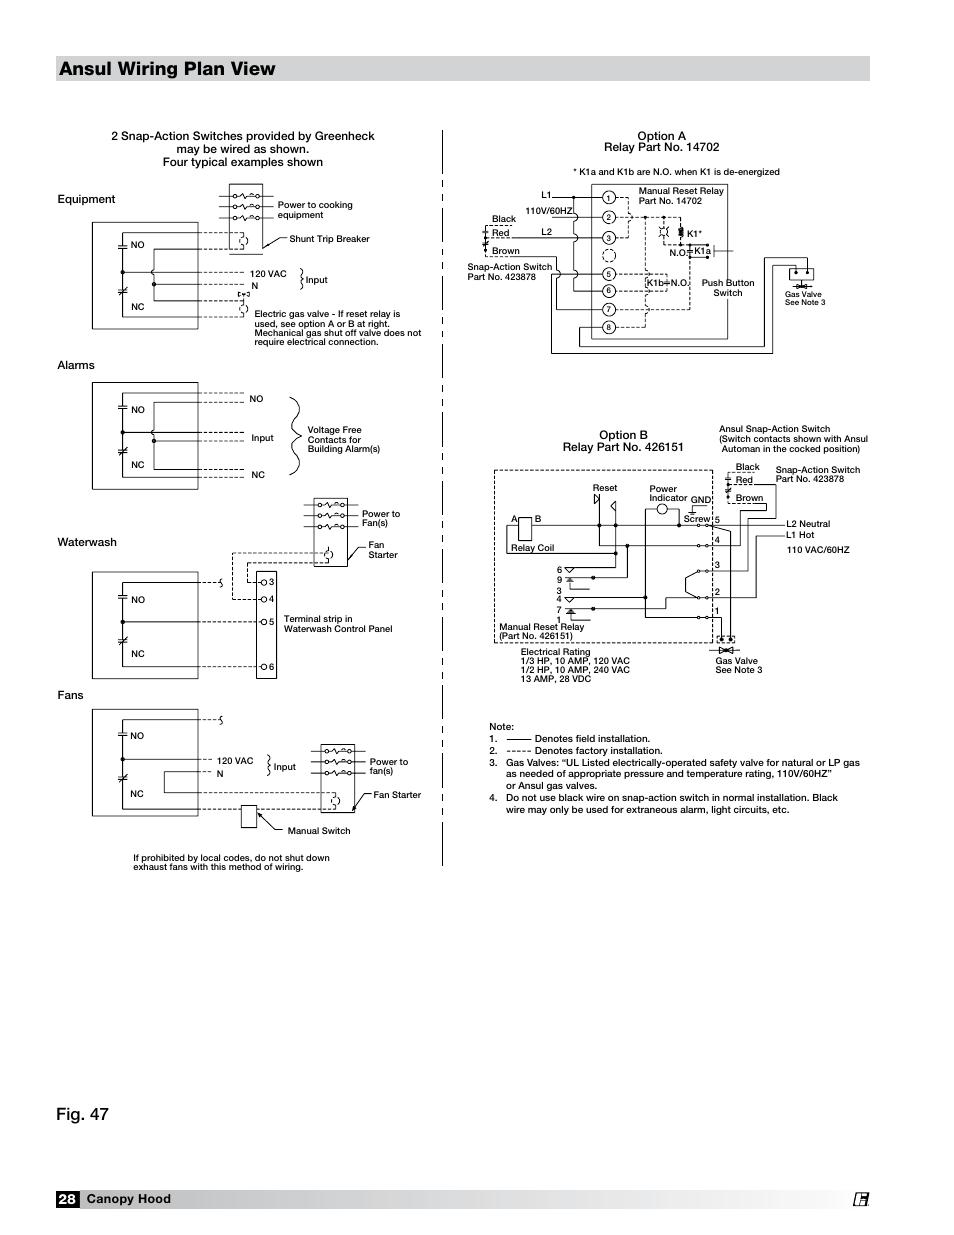 greenheck kitchen hood wiring diagram free download wiring diagrams rh escopeta co Residential Electrical Wiring Diagrams Automotive Wiring Diagrams